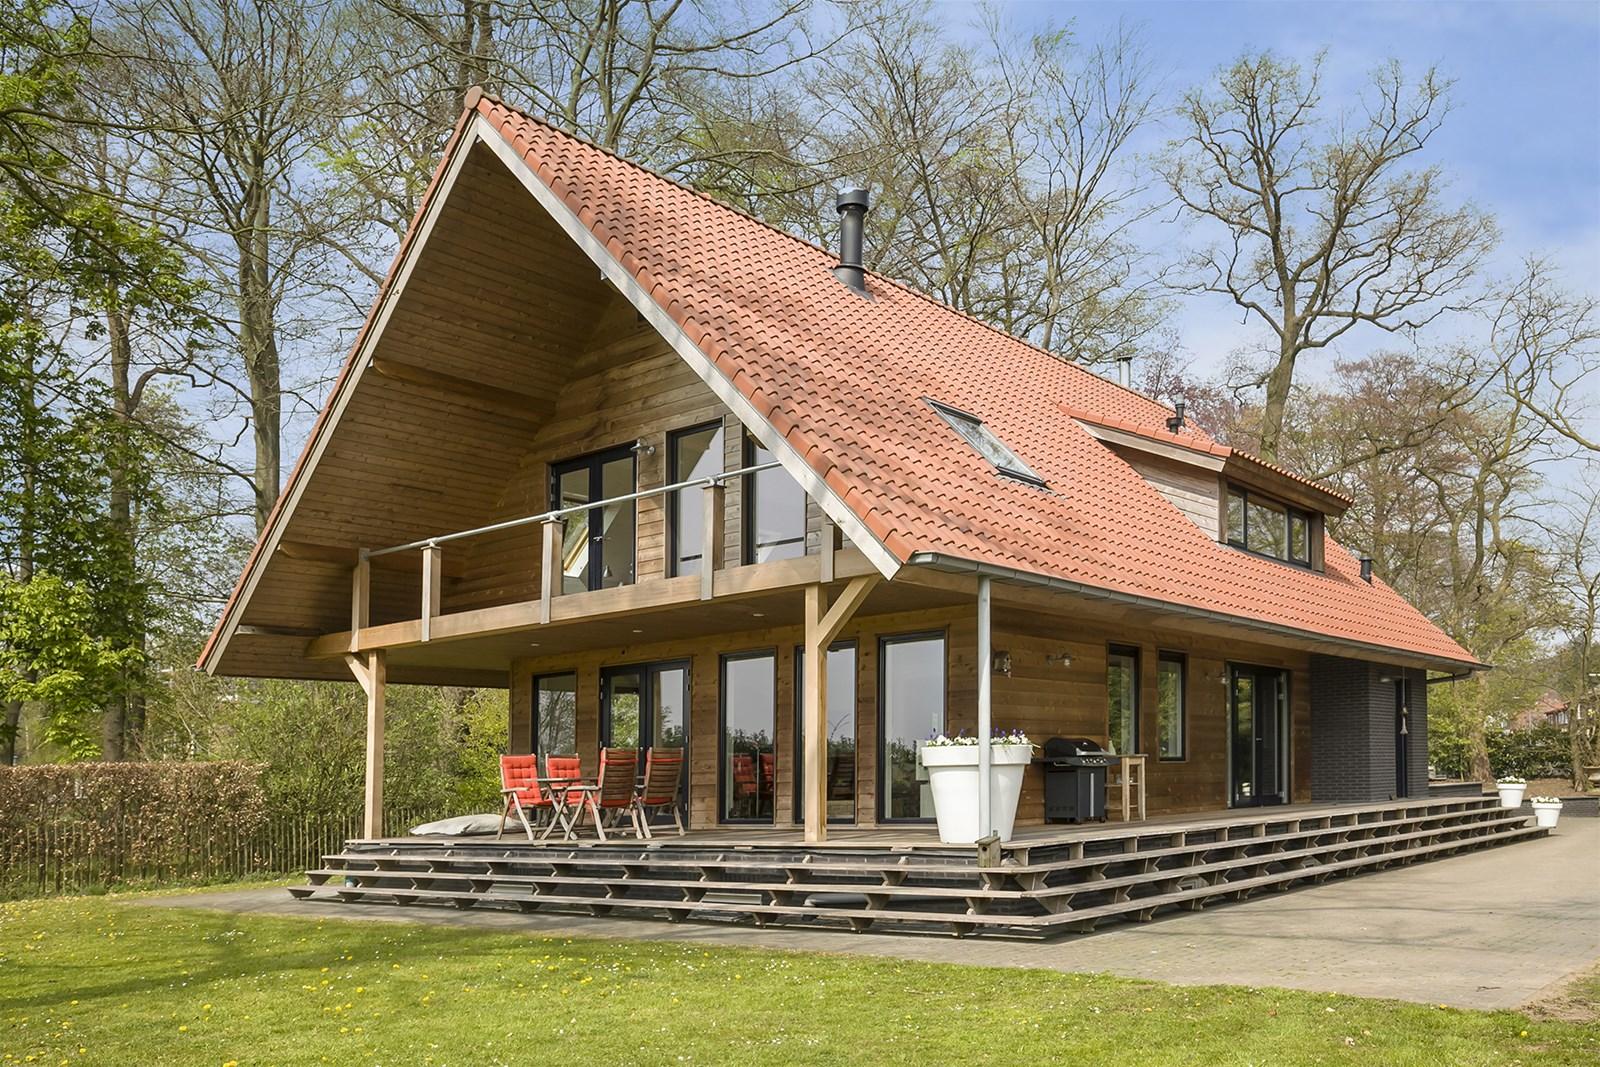 Hsb schuurwoning finnlogs houtbouw bv for Houten huis laten bouwen